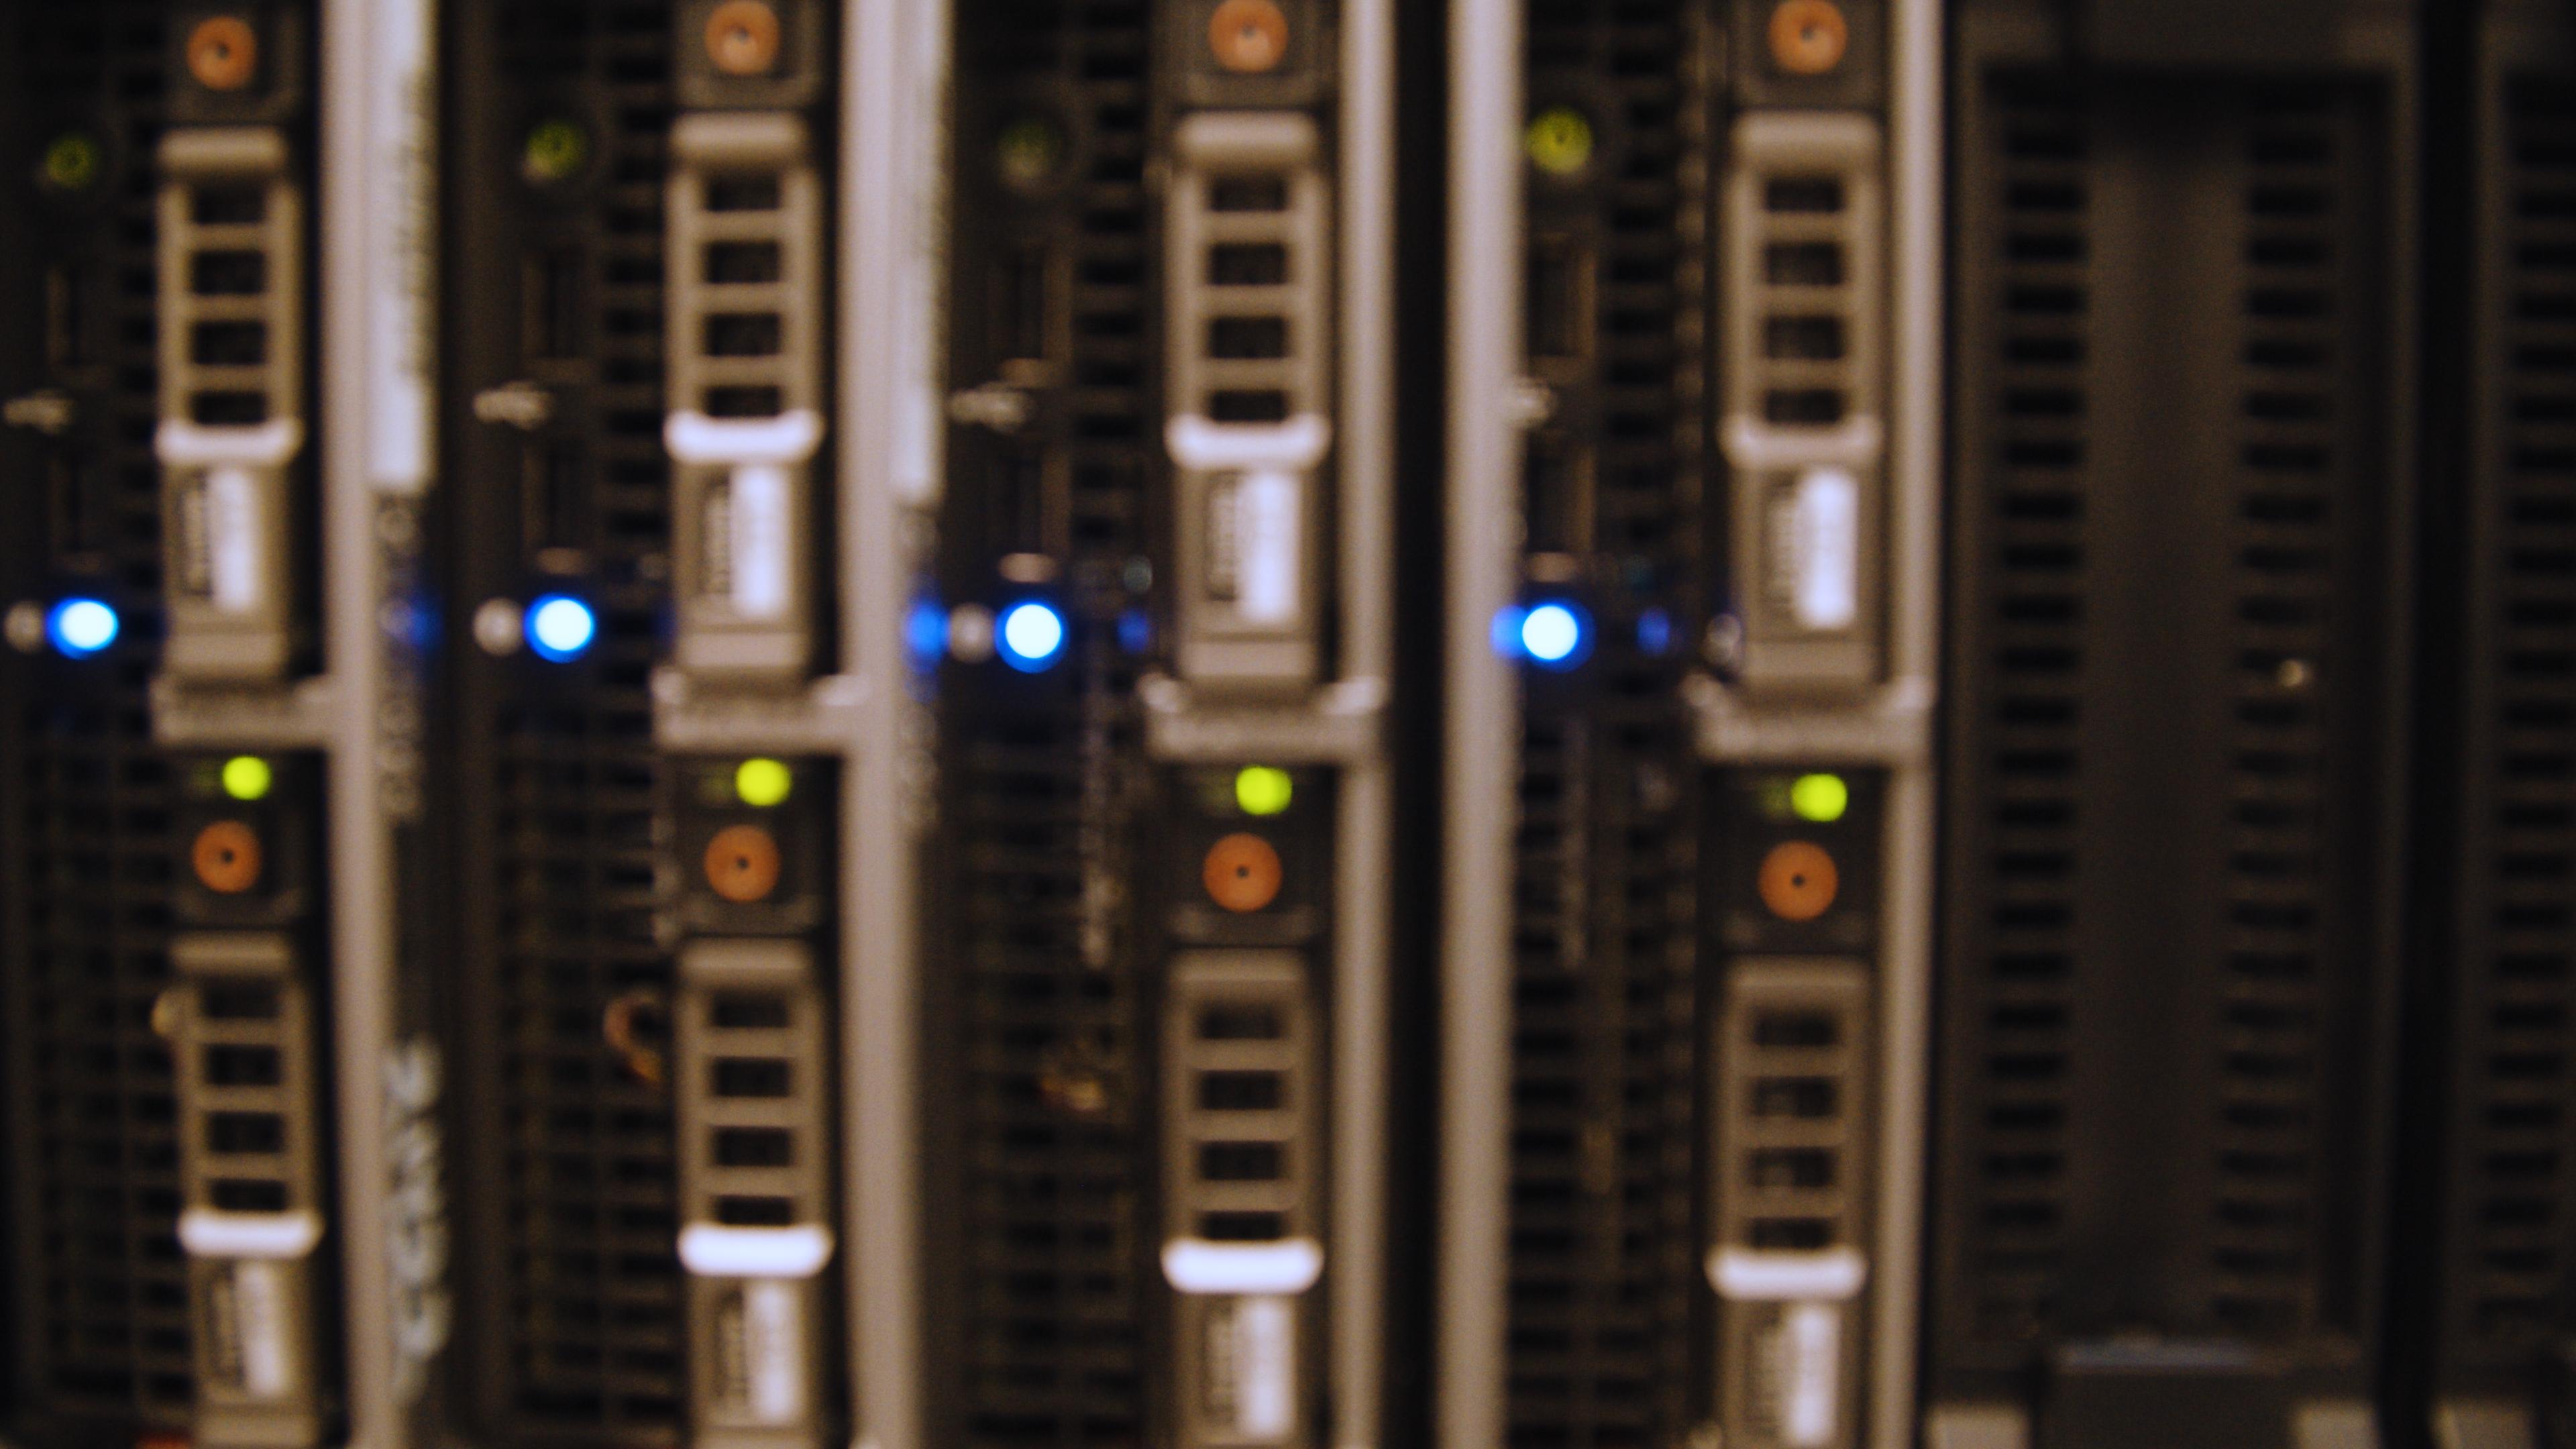 computer equipment, servers blinking blue lights